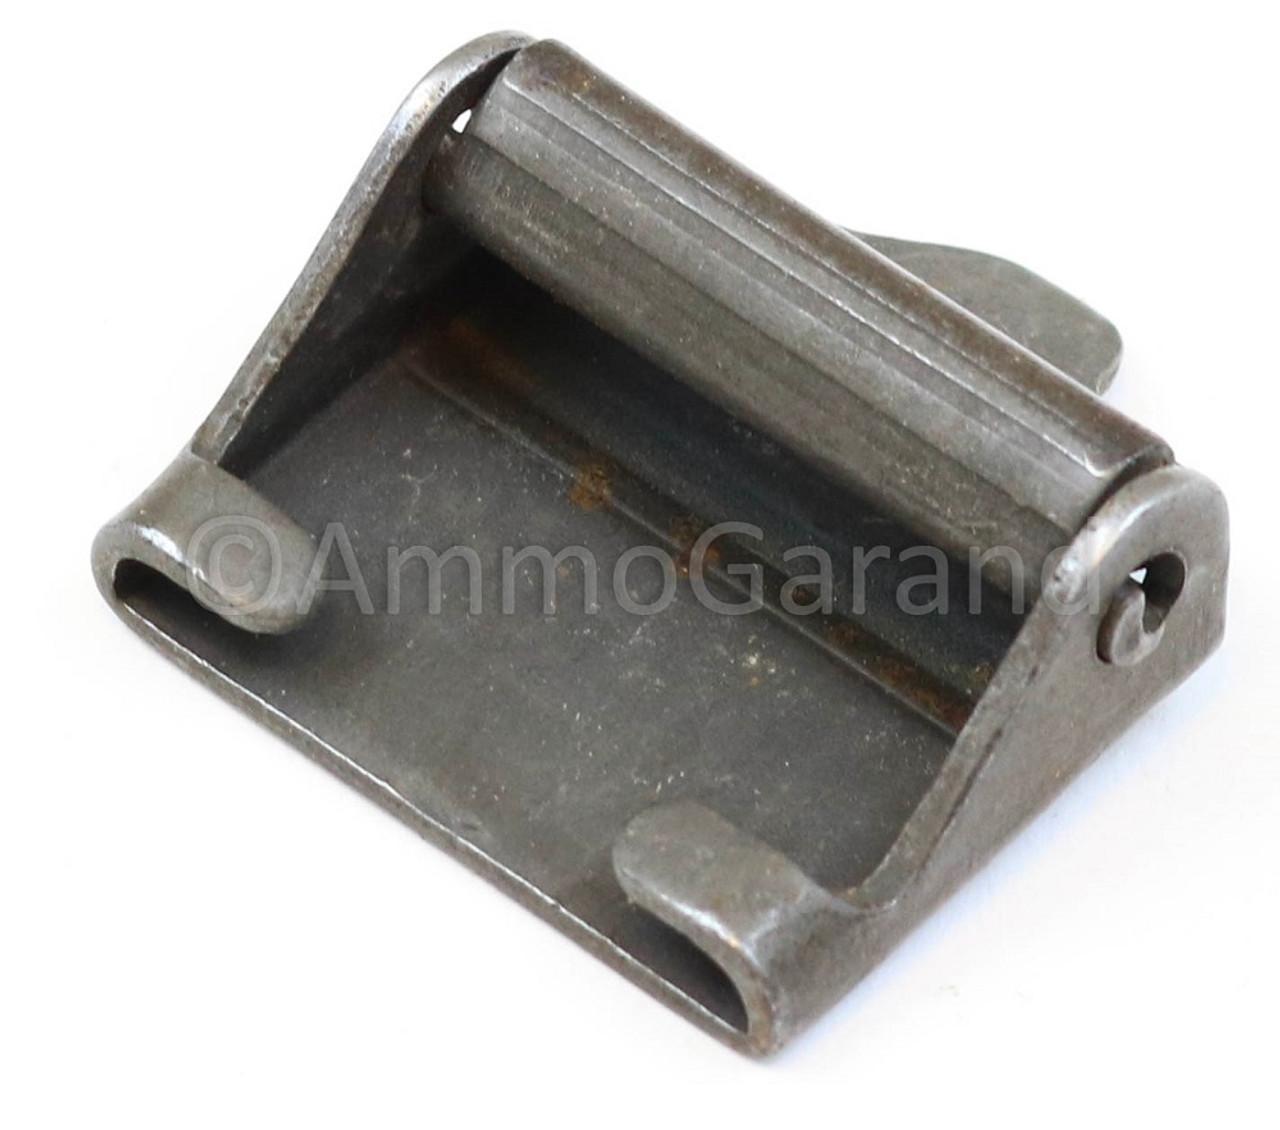 M1 Garand Web Sling Keeper Buckle M14 M1A M16 USGI Surplus - USED